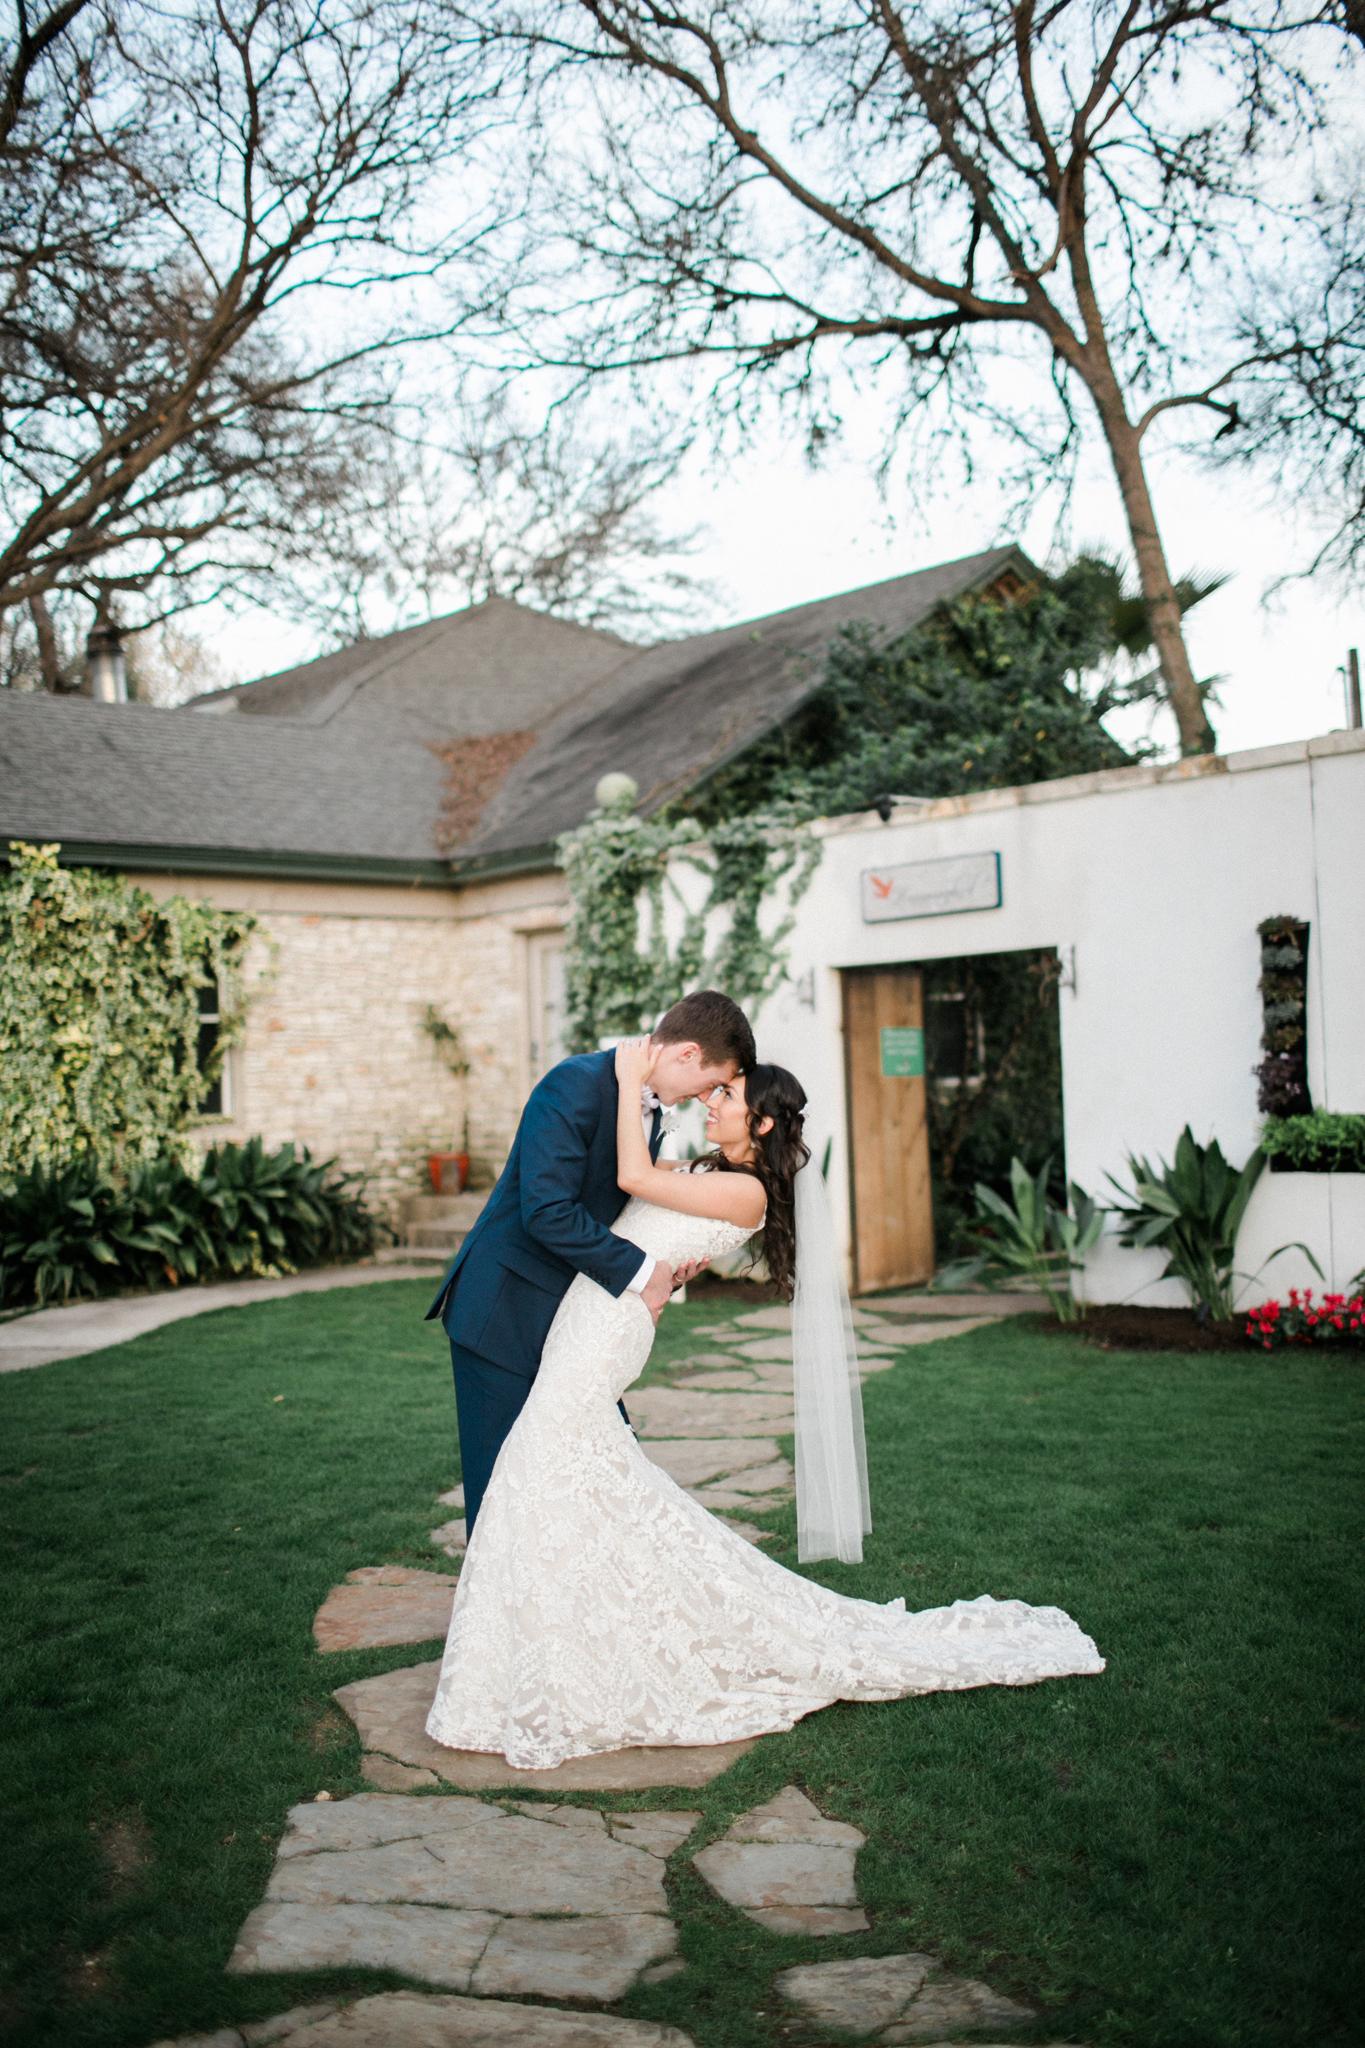 Hummingbird-House-Wedding-M-M-459.png